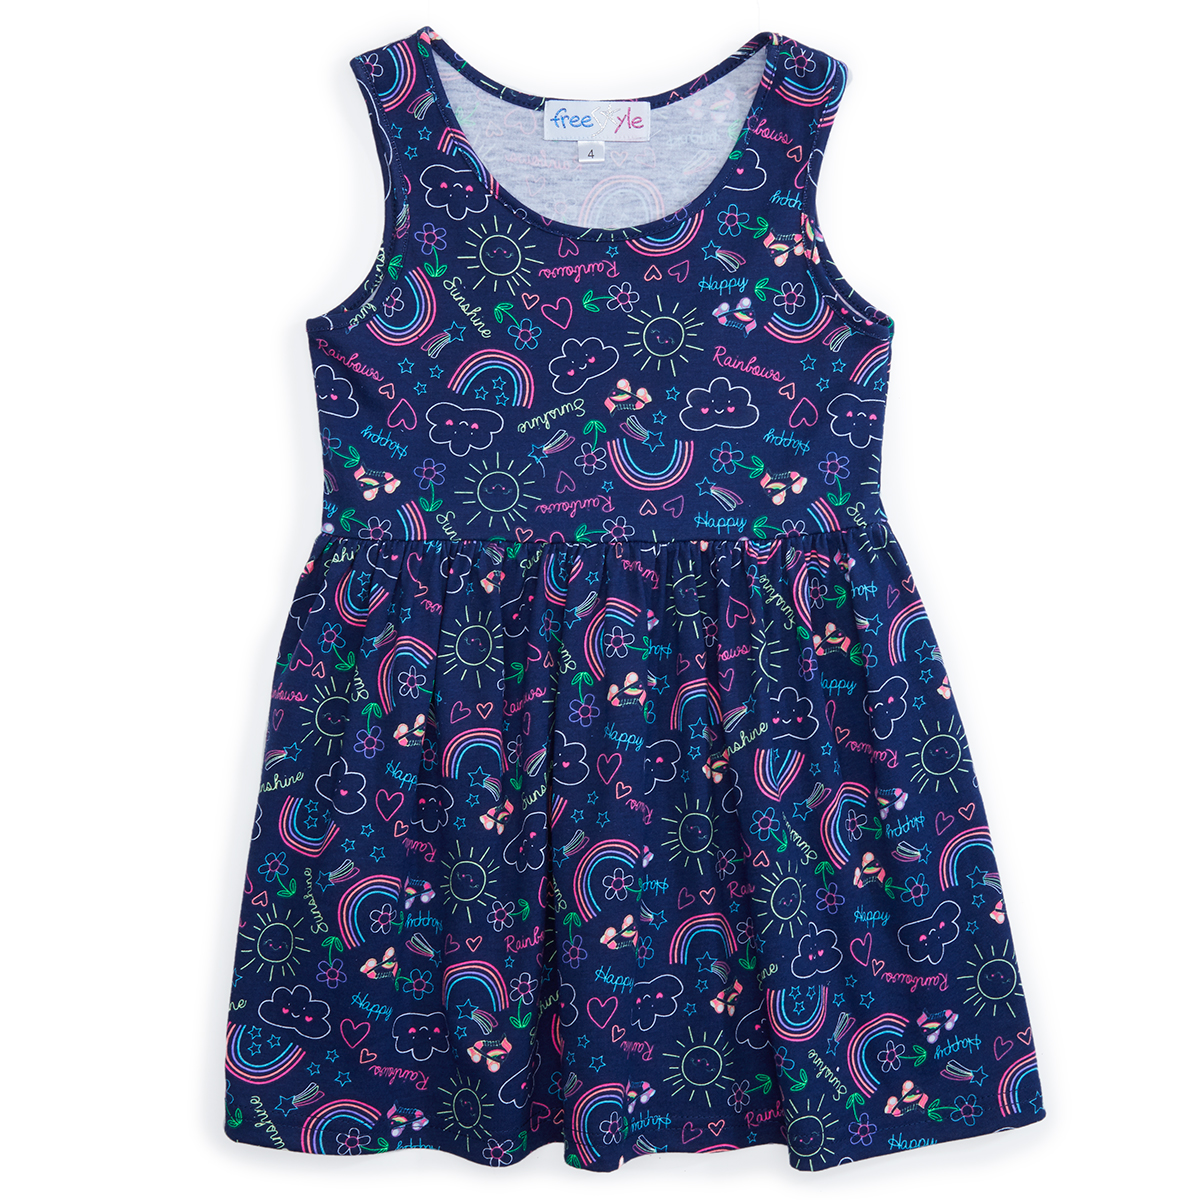 Freestyle Girls' Sleeveless Dress - Black, 6X